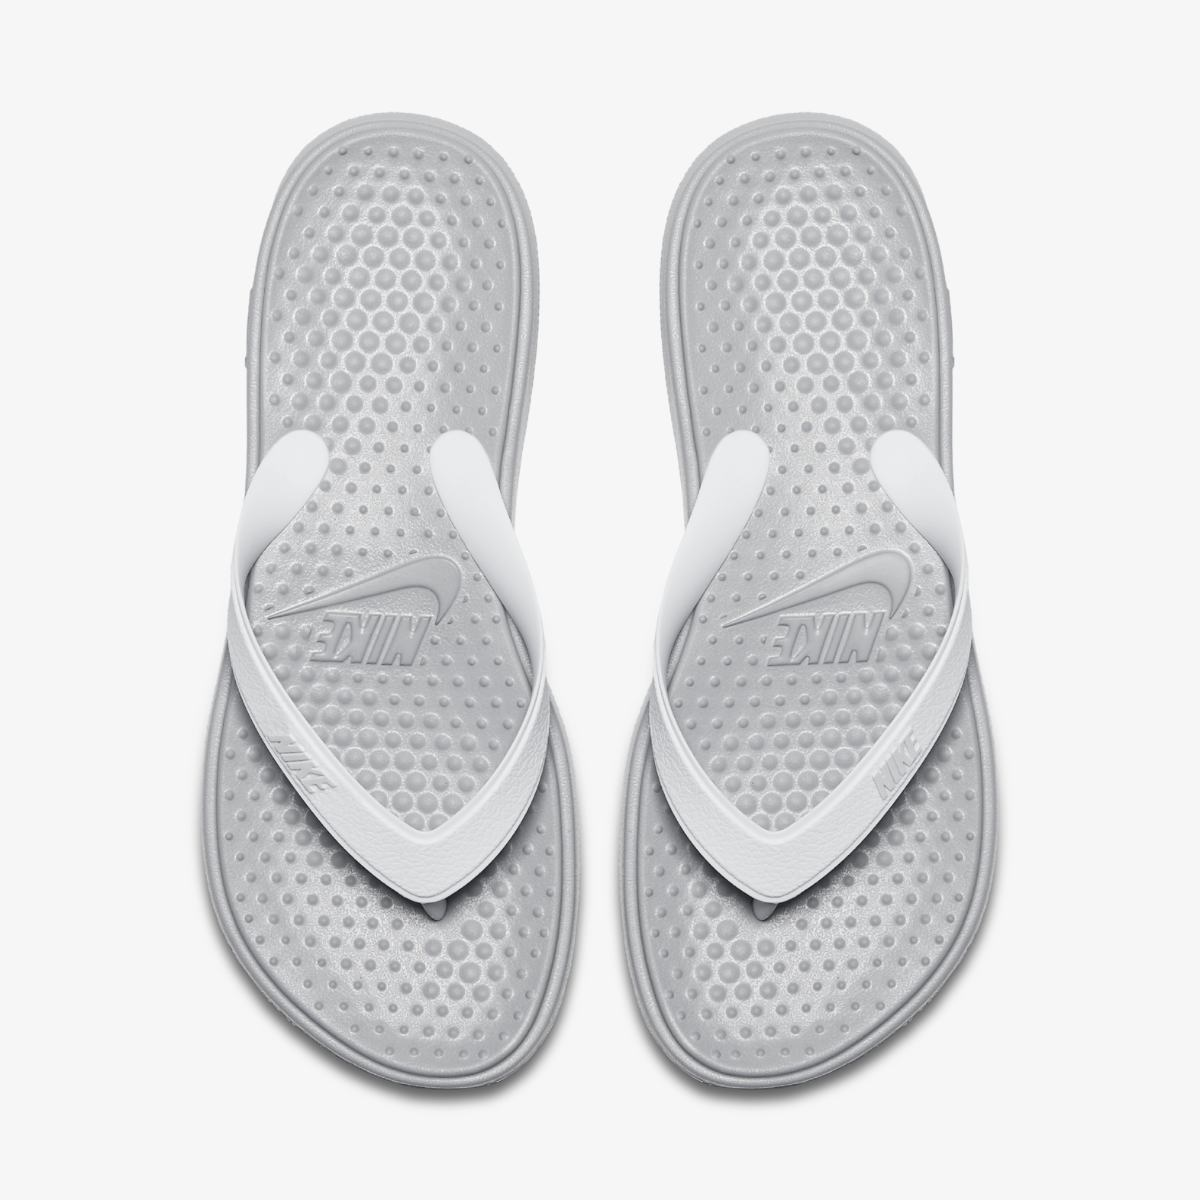 746e38d5 Тапочки Nike WMNS SOLAY THONG 882699-003 купить | deltasport.ua